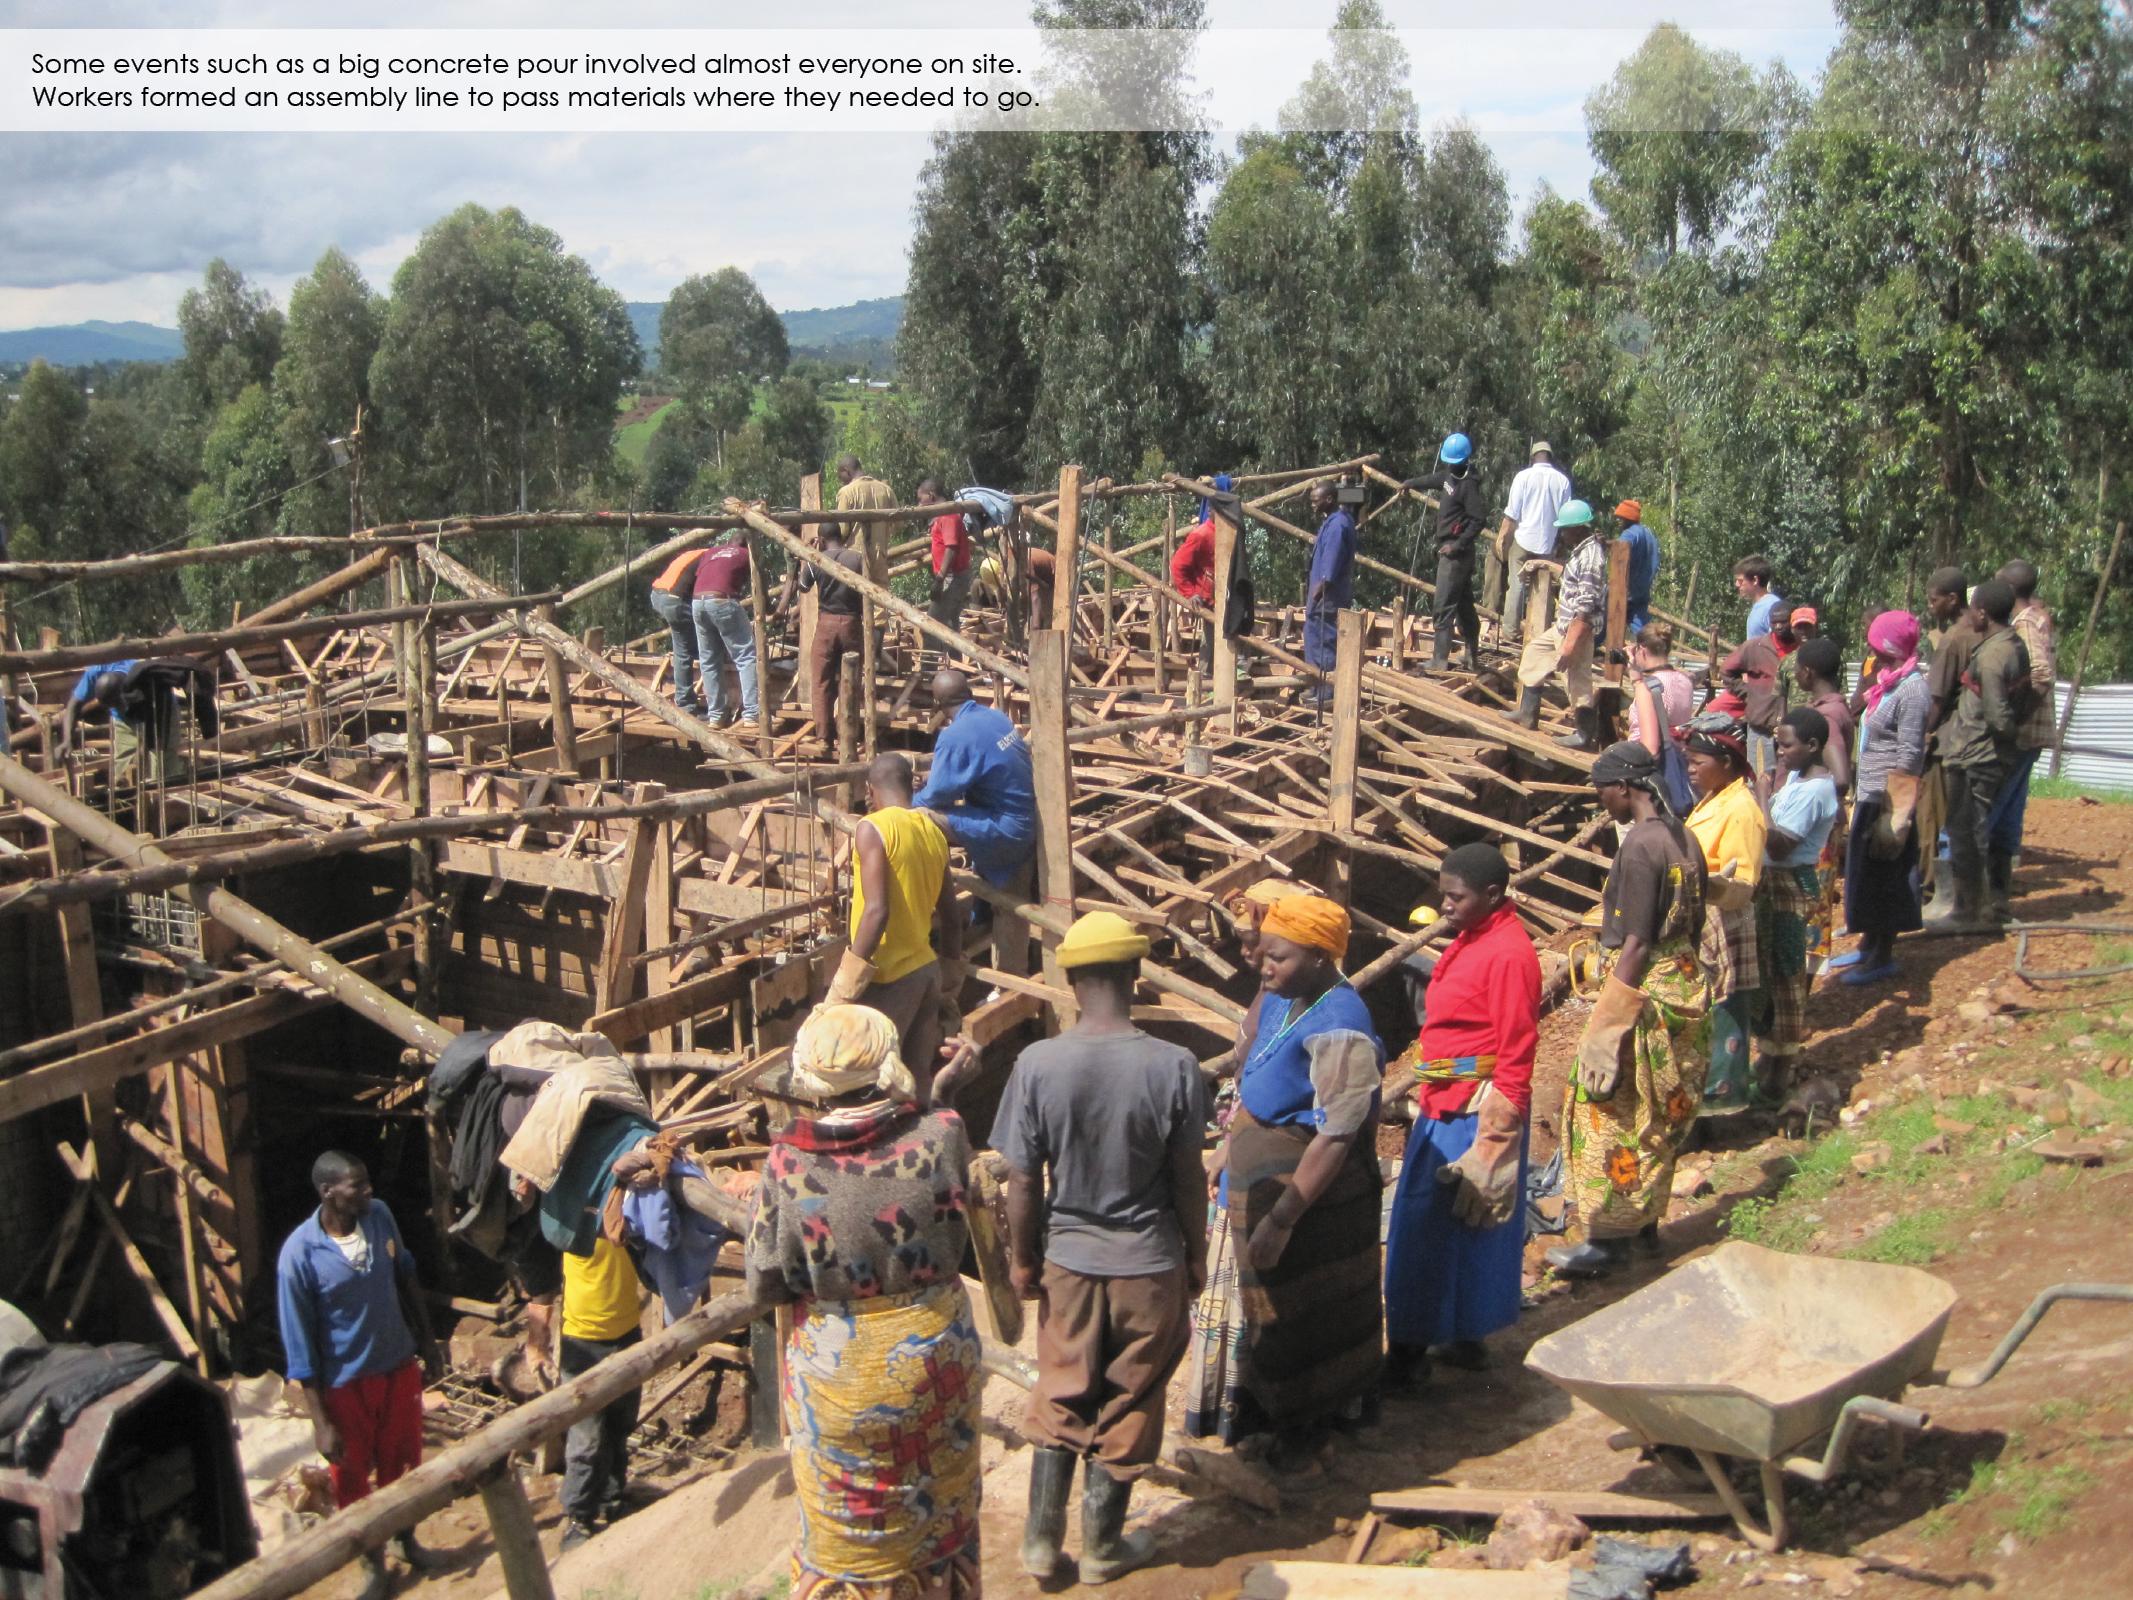 Gaugler_RwandaExperience_p26.jpg